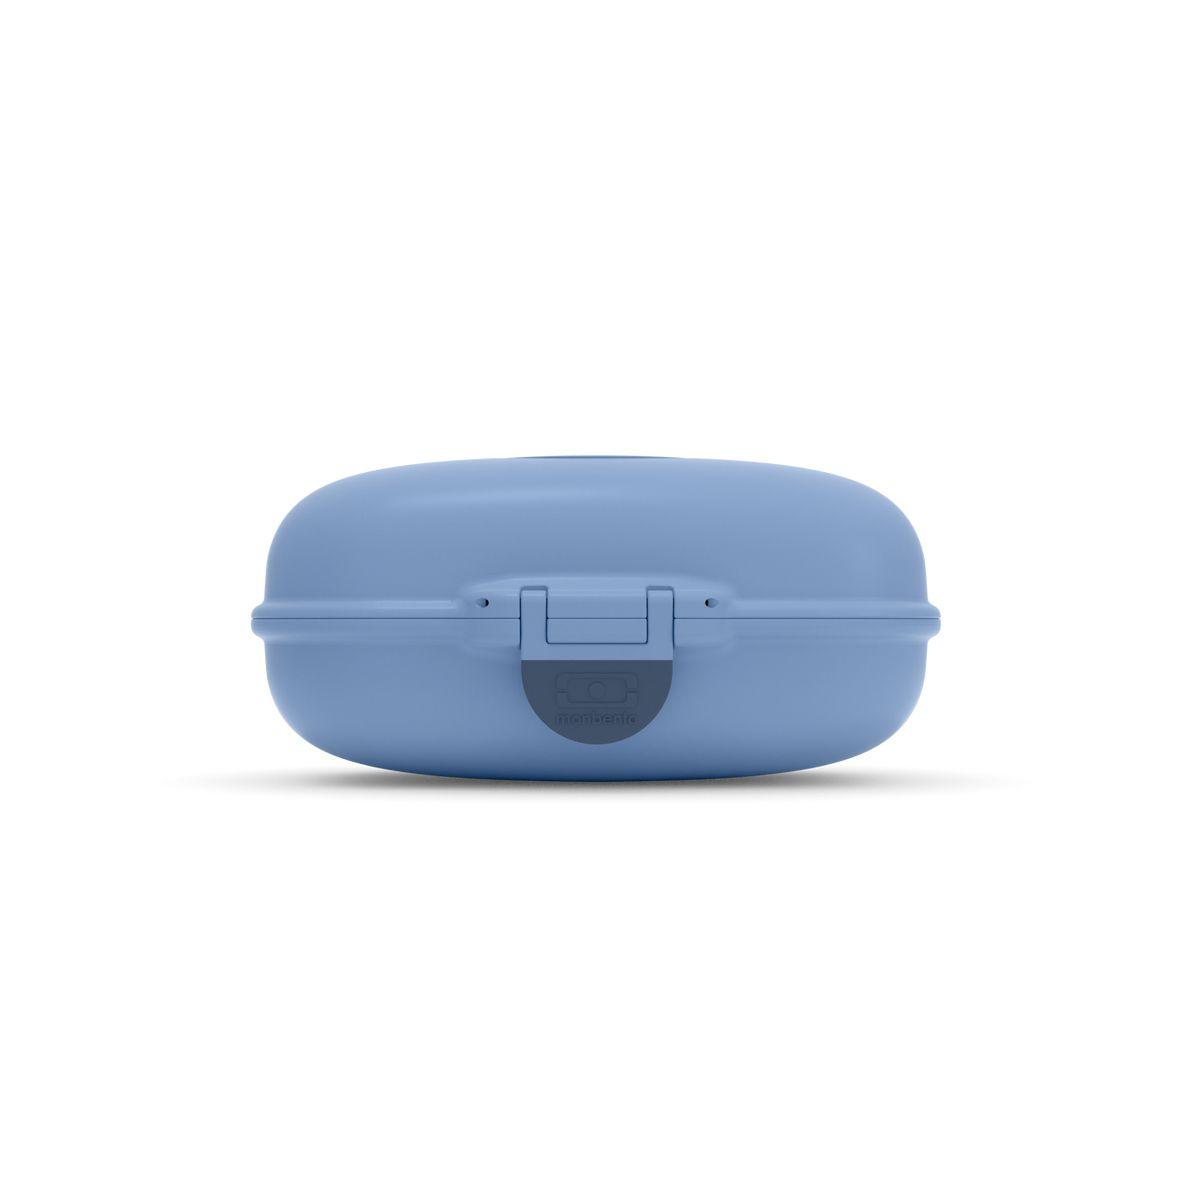 Boite à goûter MB Gram bleu foncé 600 ml 7 x 14.8 x 11.4 cm - Monbento